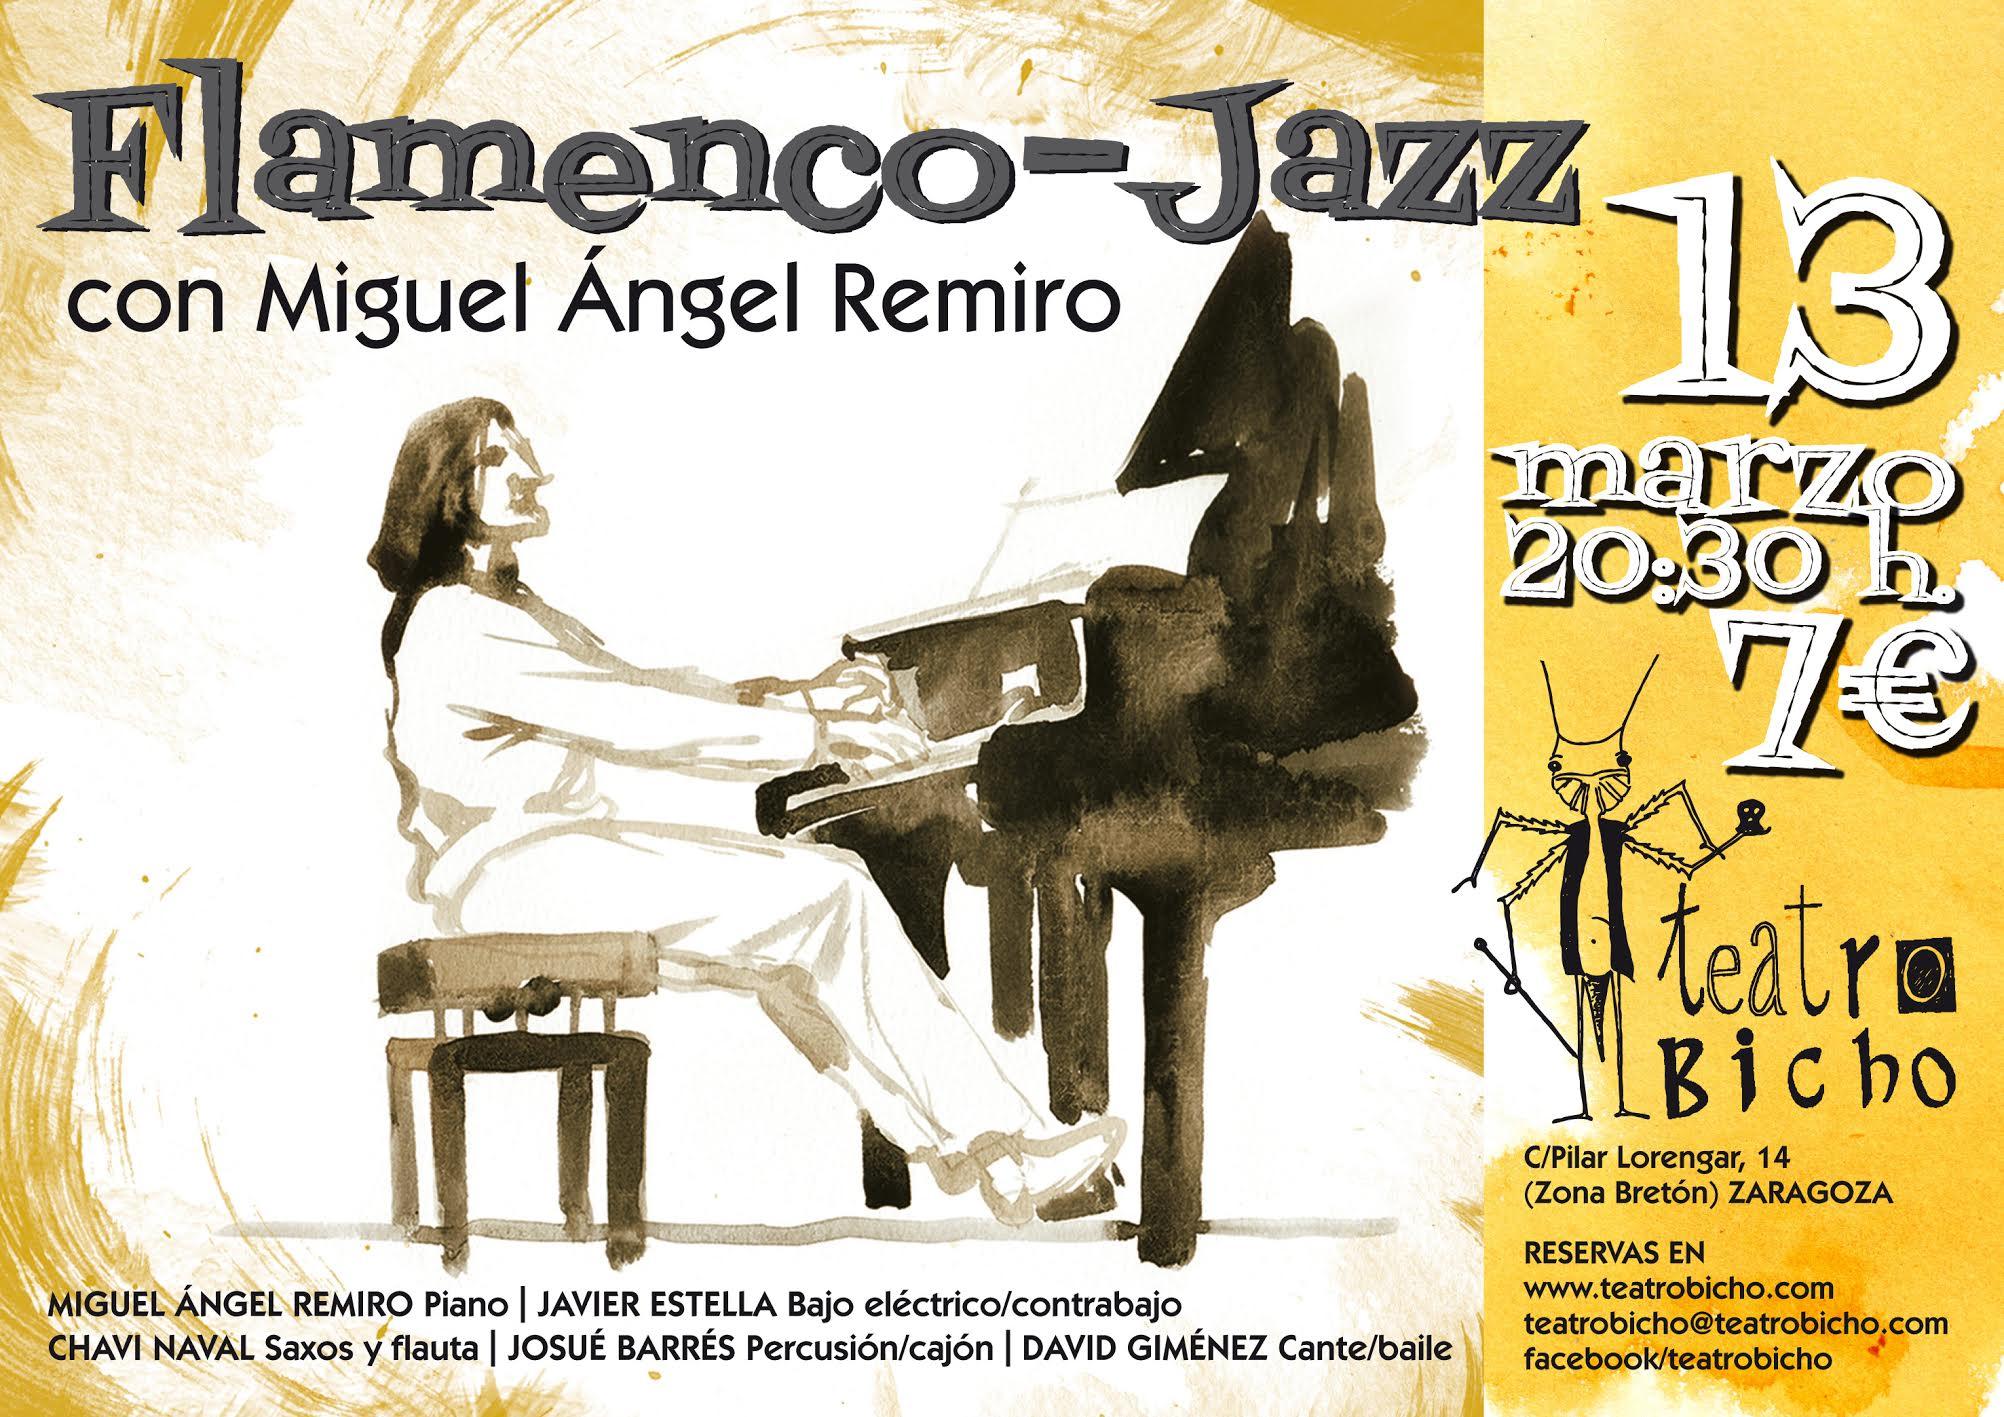 Flamenco-jazz M.A.Remiro